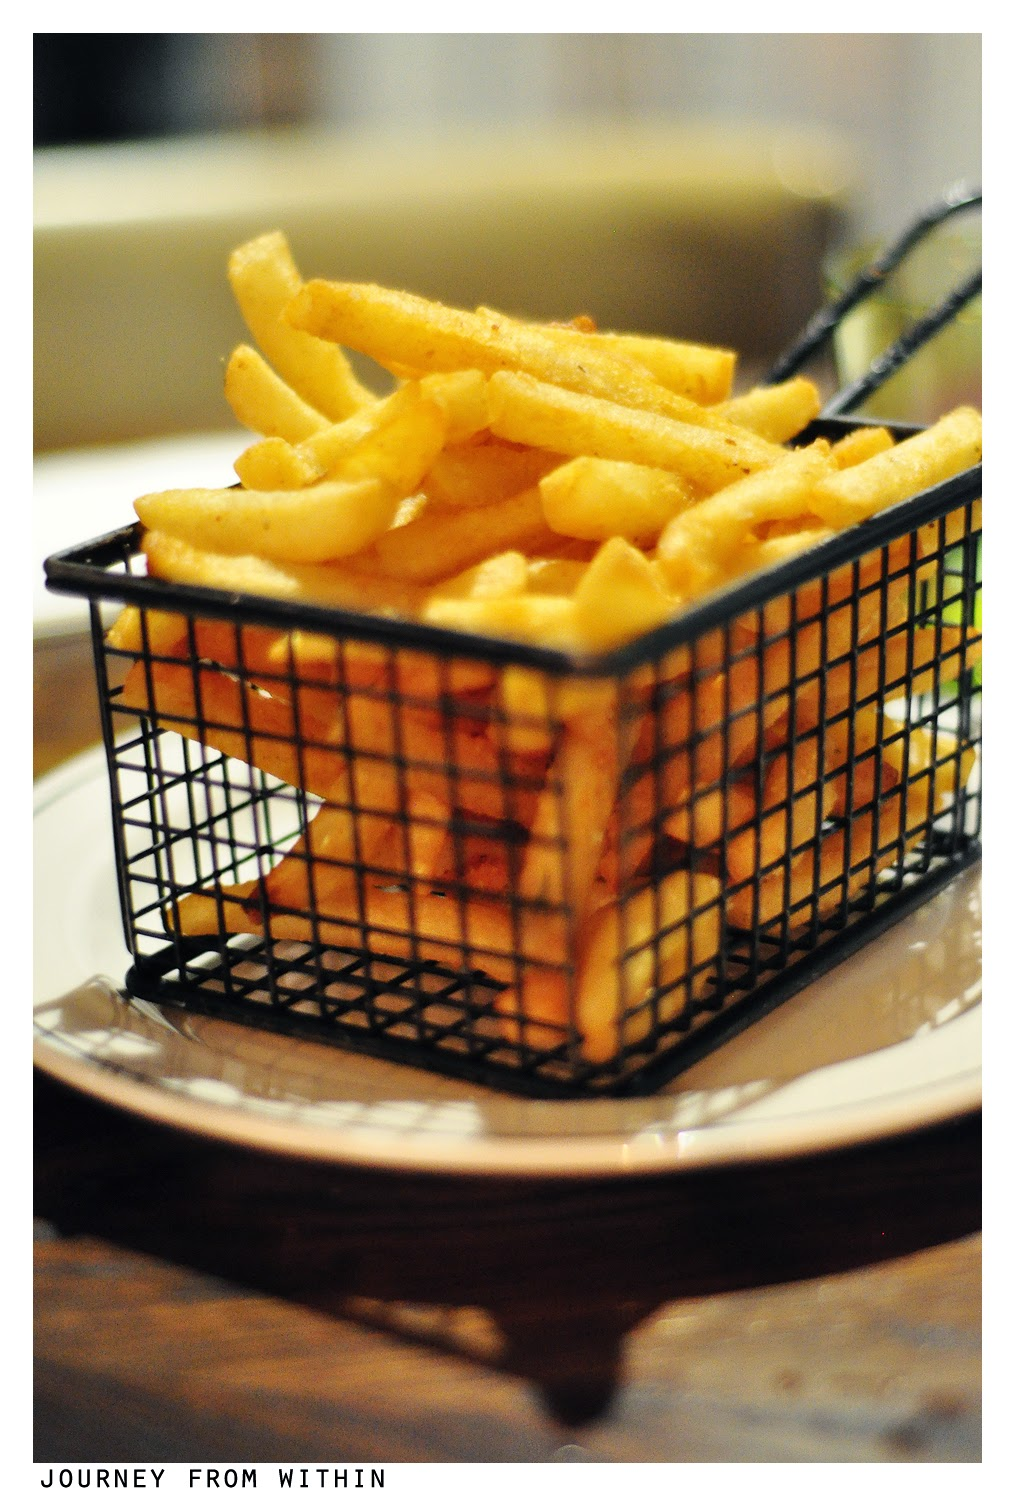 Fries with celery & herb salt